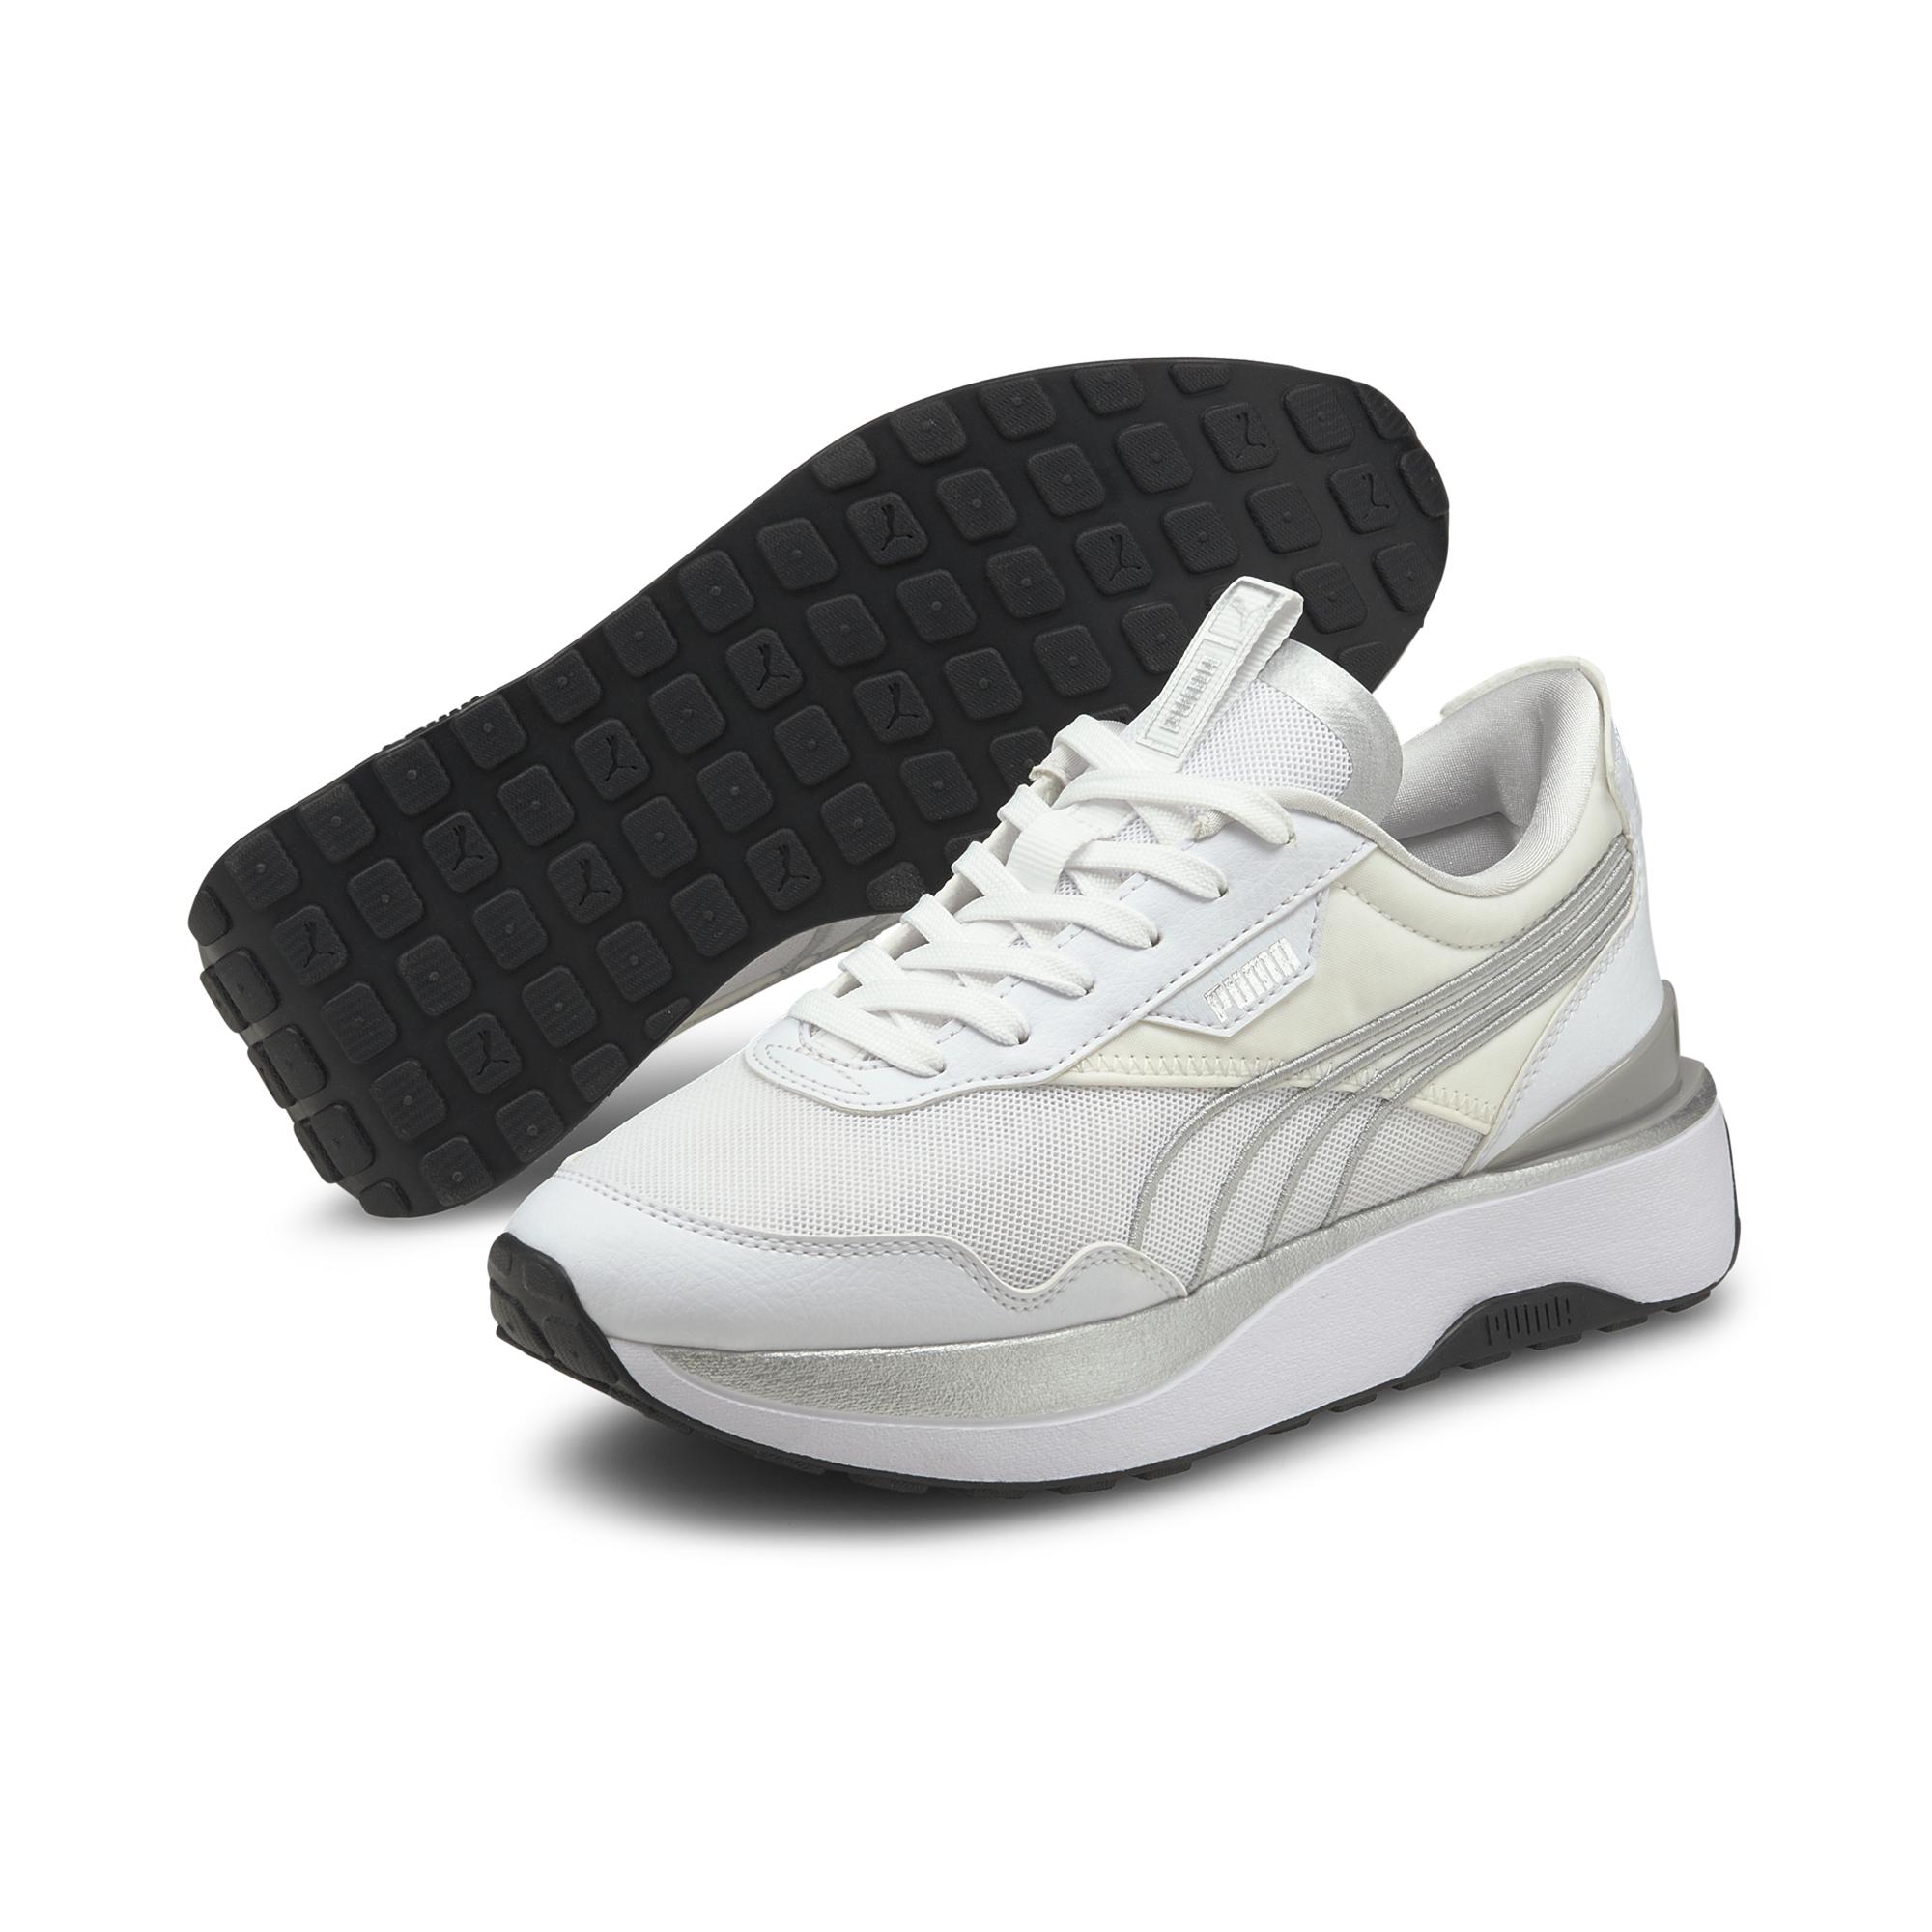 Puma Cruise Rider sneakers